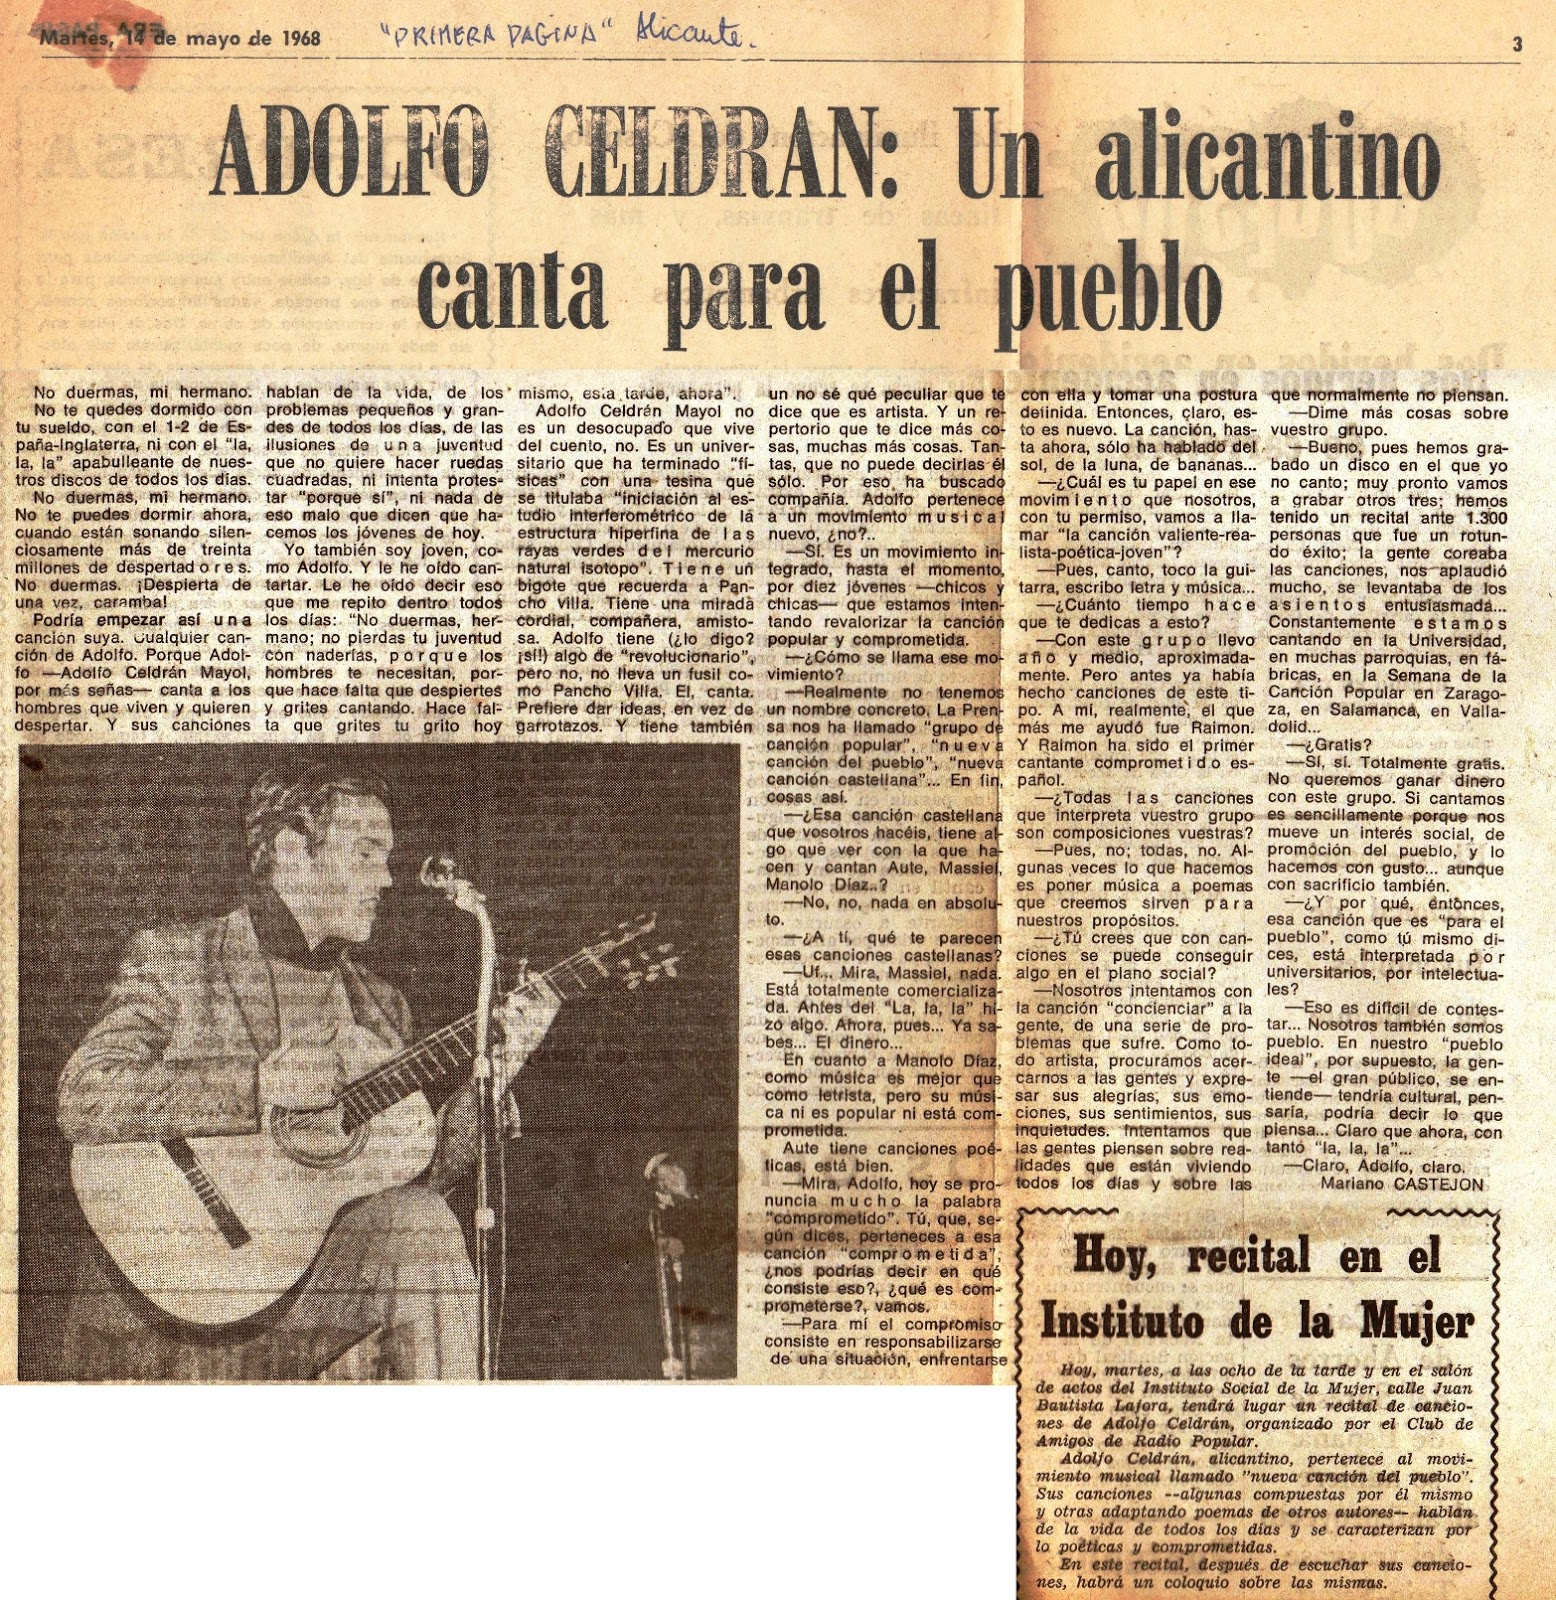 Memoria m sico festiva de un jubilado tocapelotas adolfo for Adolfo dominguez mendez alvaro 9